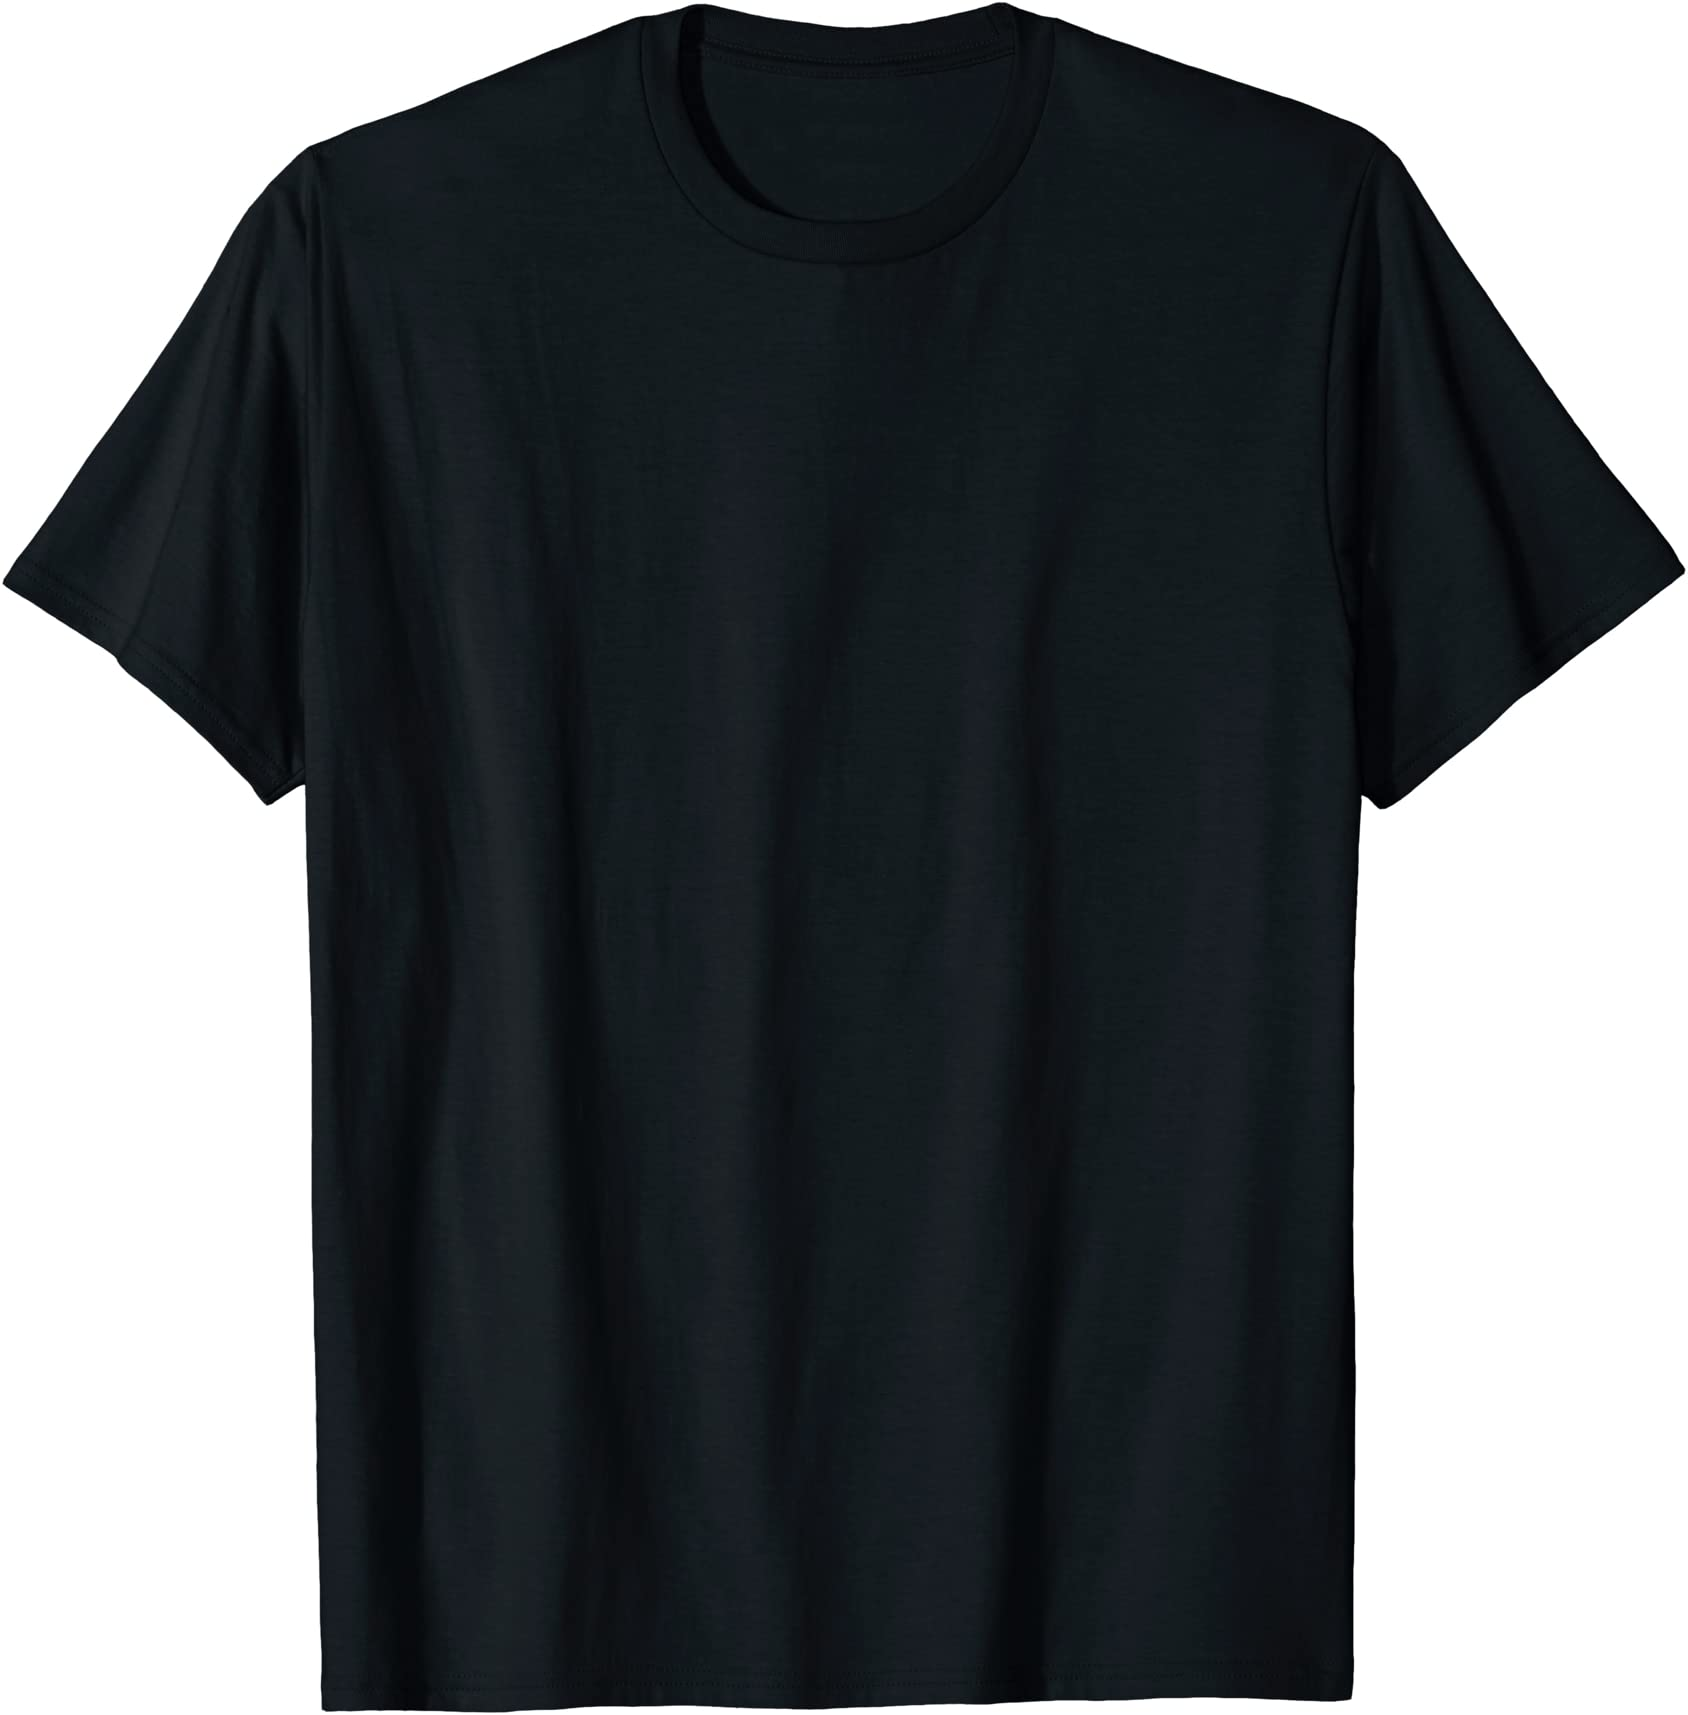 Top Top Boys /catarex/ Long Sleeve T-Shirt